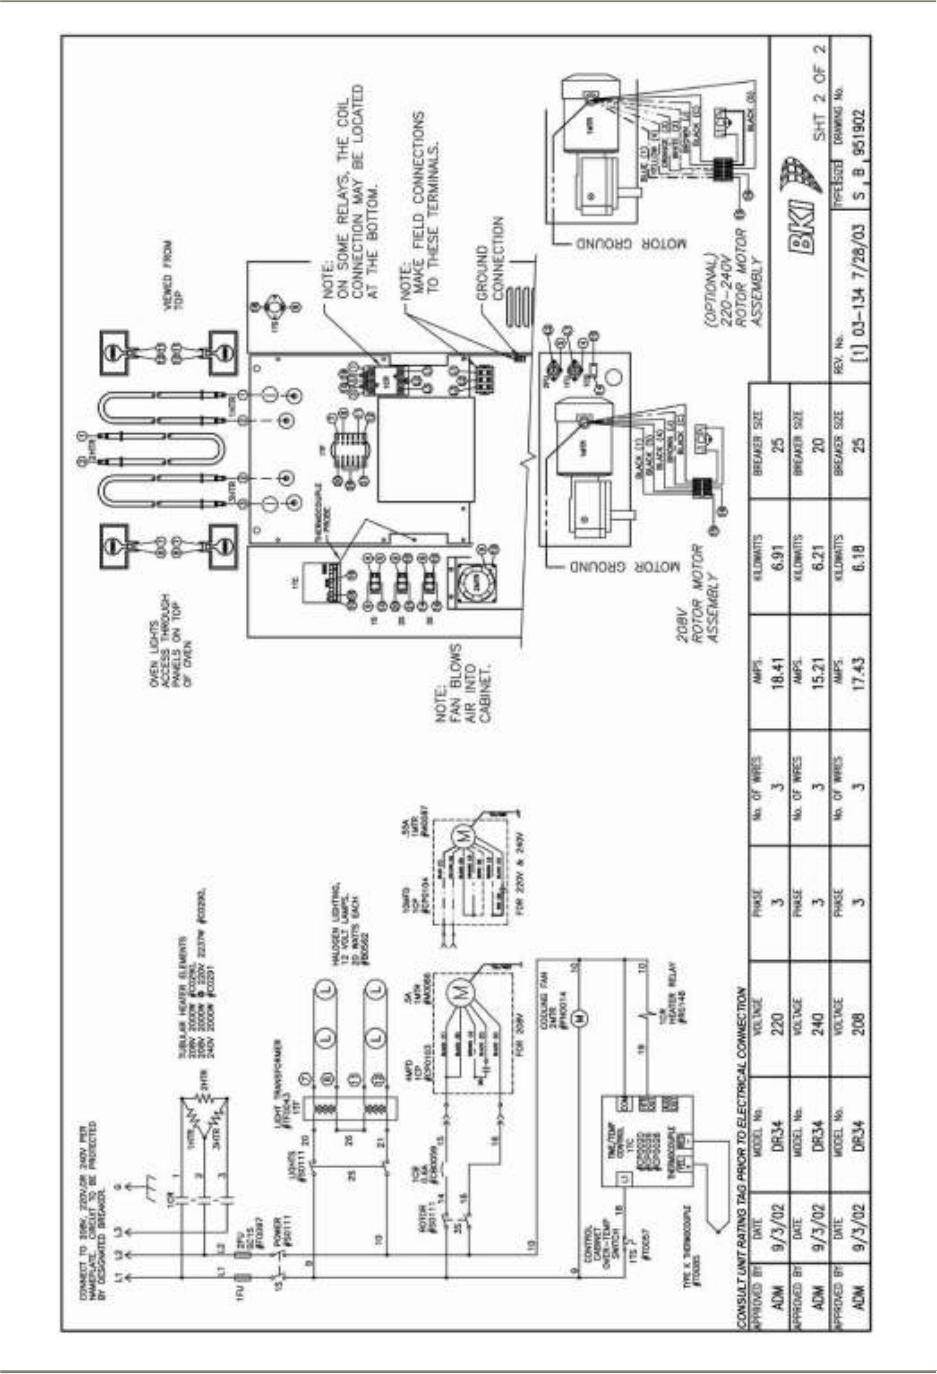 Dr34sm Double Revolving Oven Dr 34 Bki Dr34 Spm 240v Wiring Diagram Diagrams